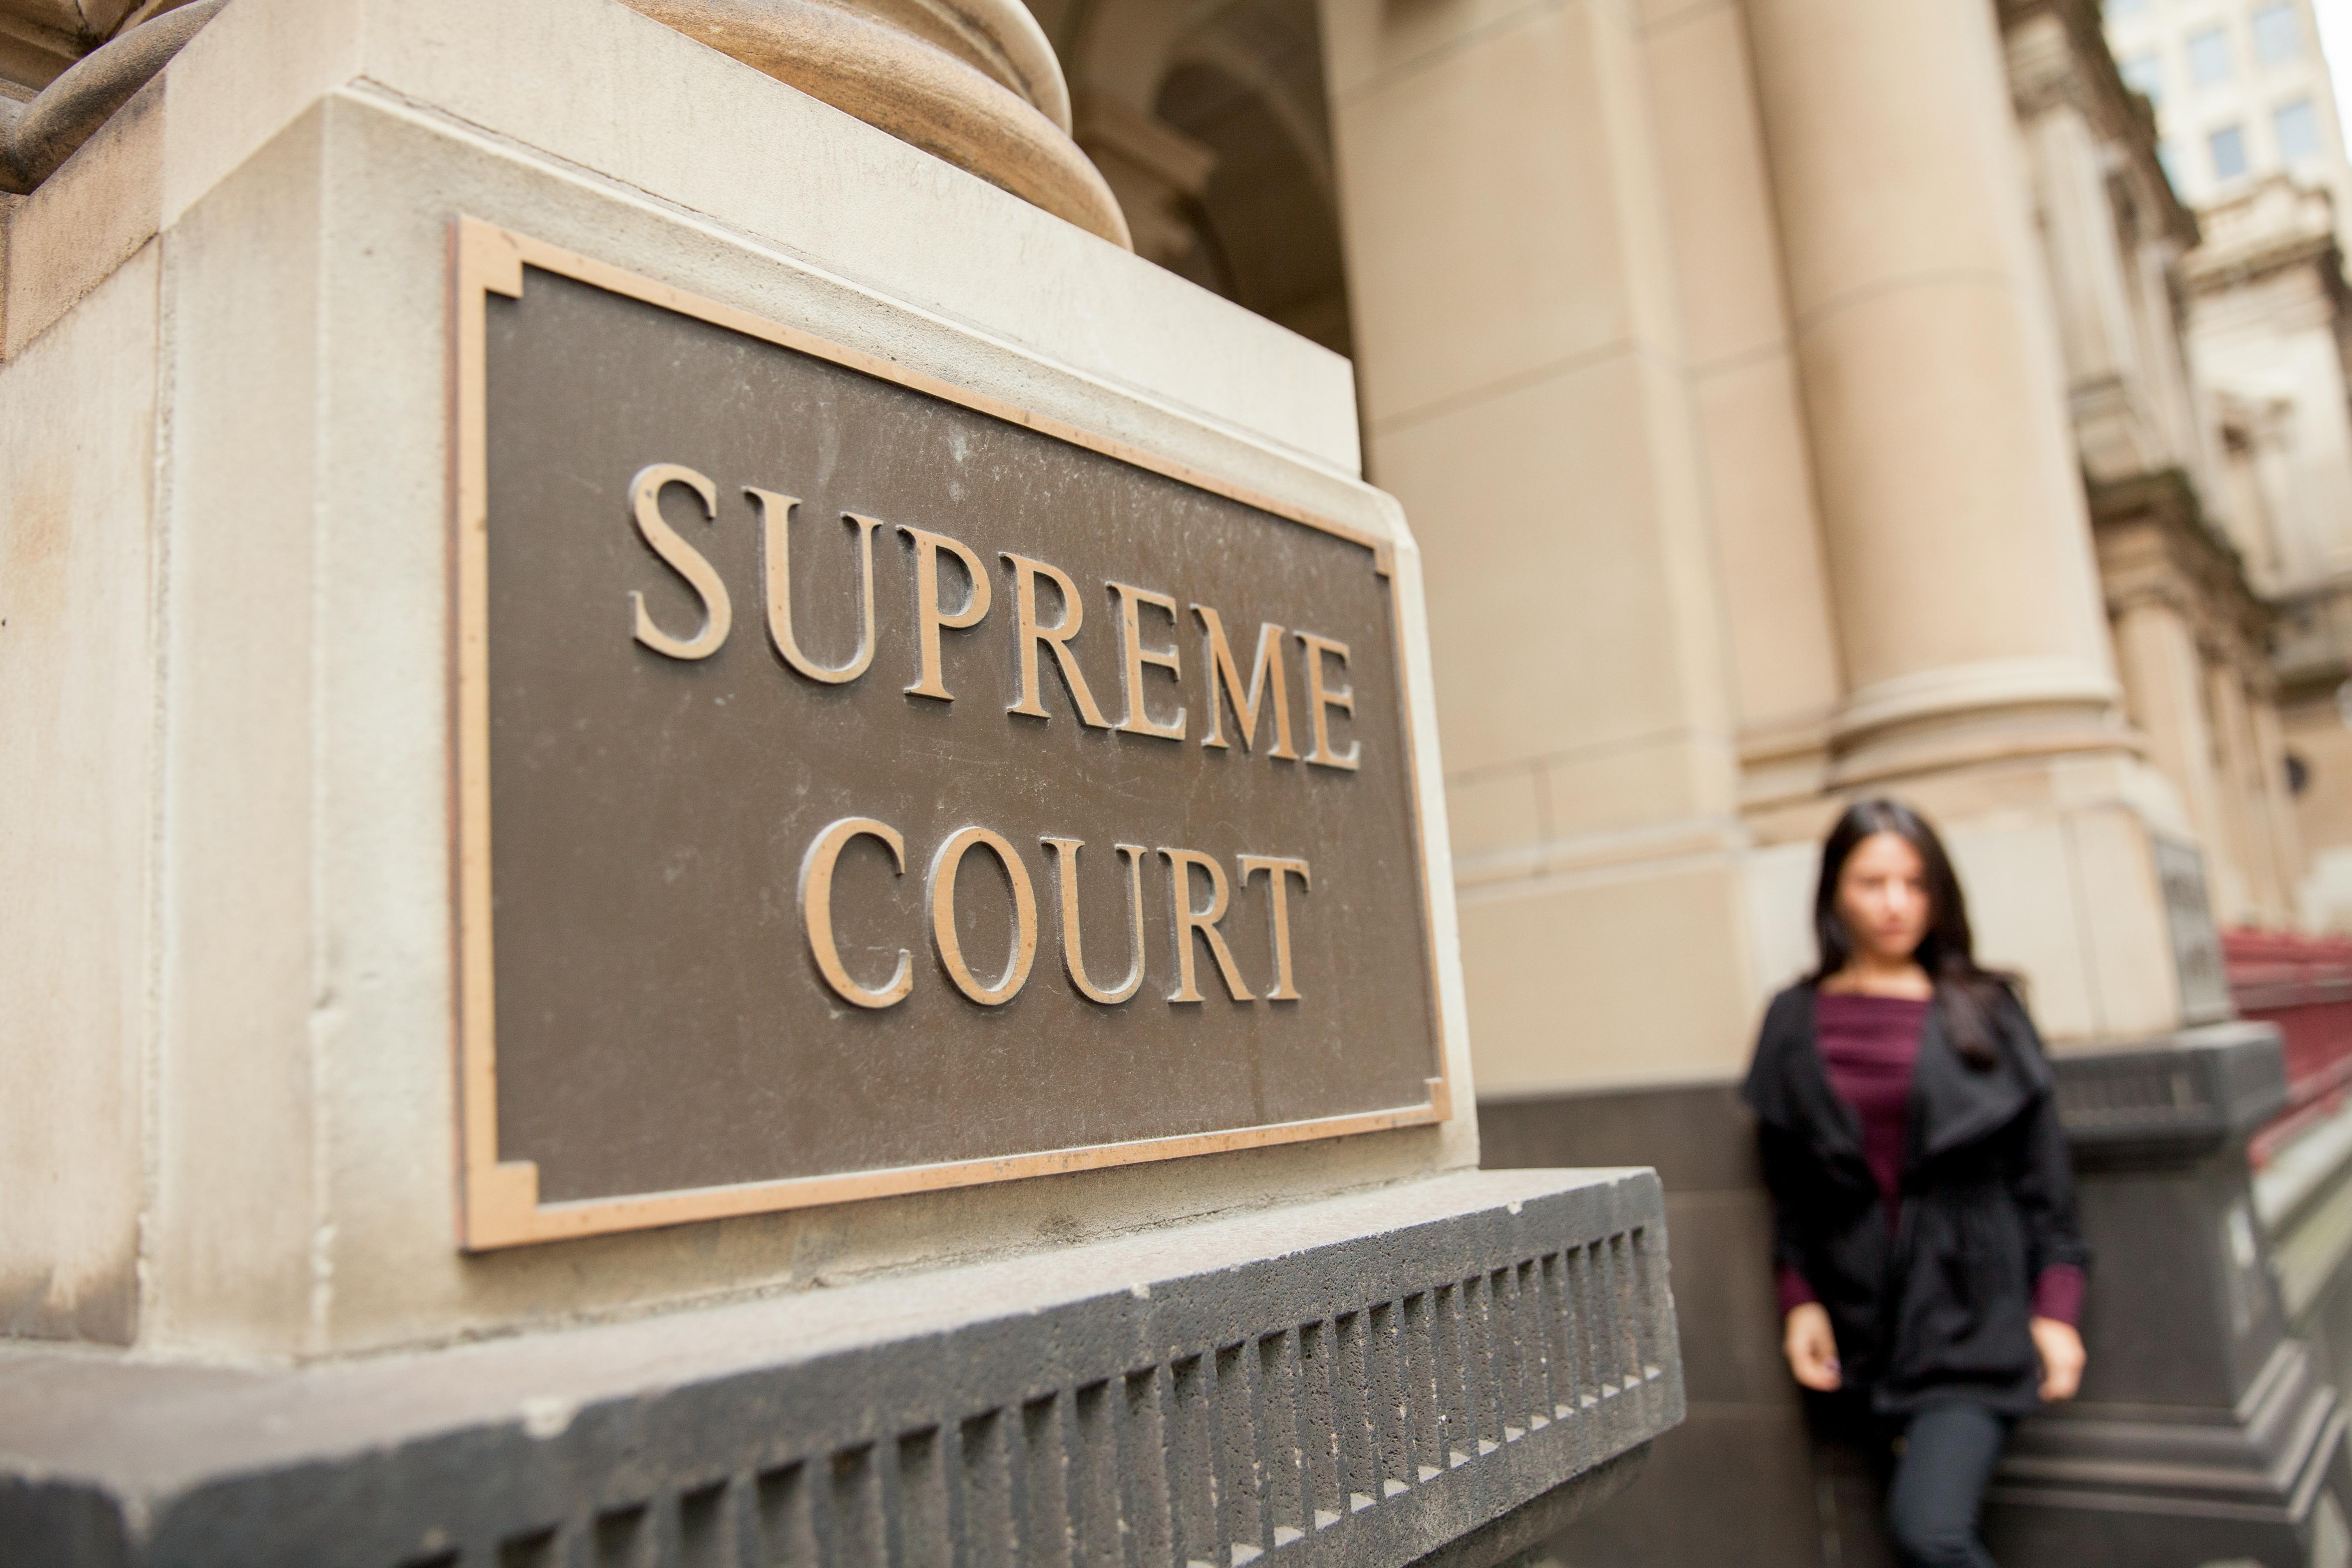 Scotus picks clayton case to decide workplace discrimination